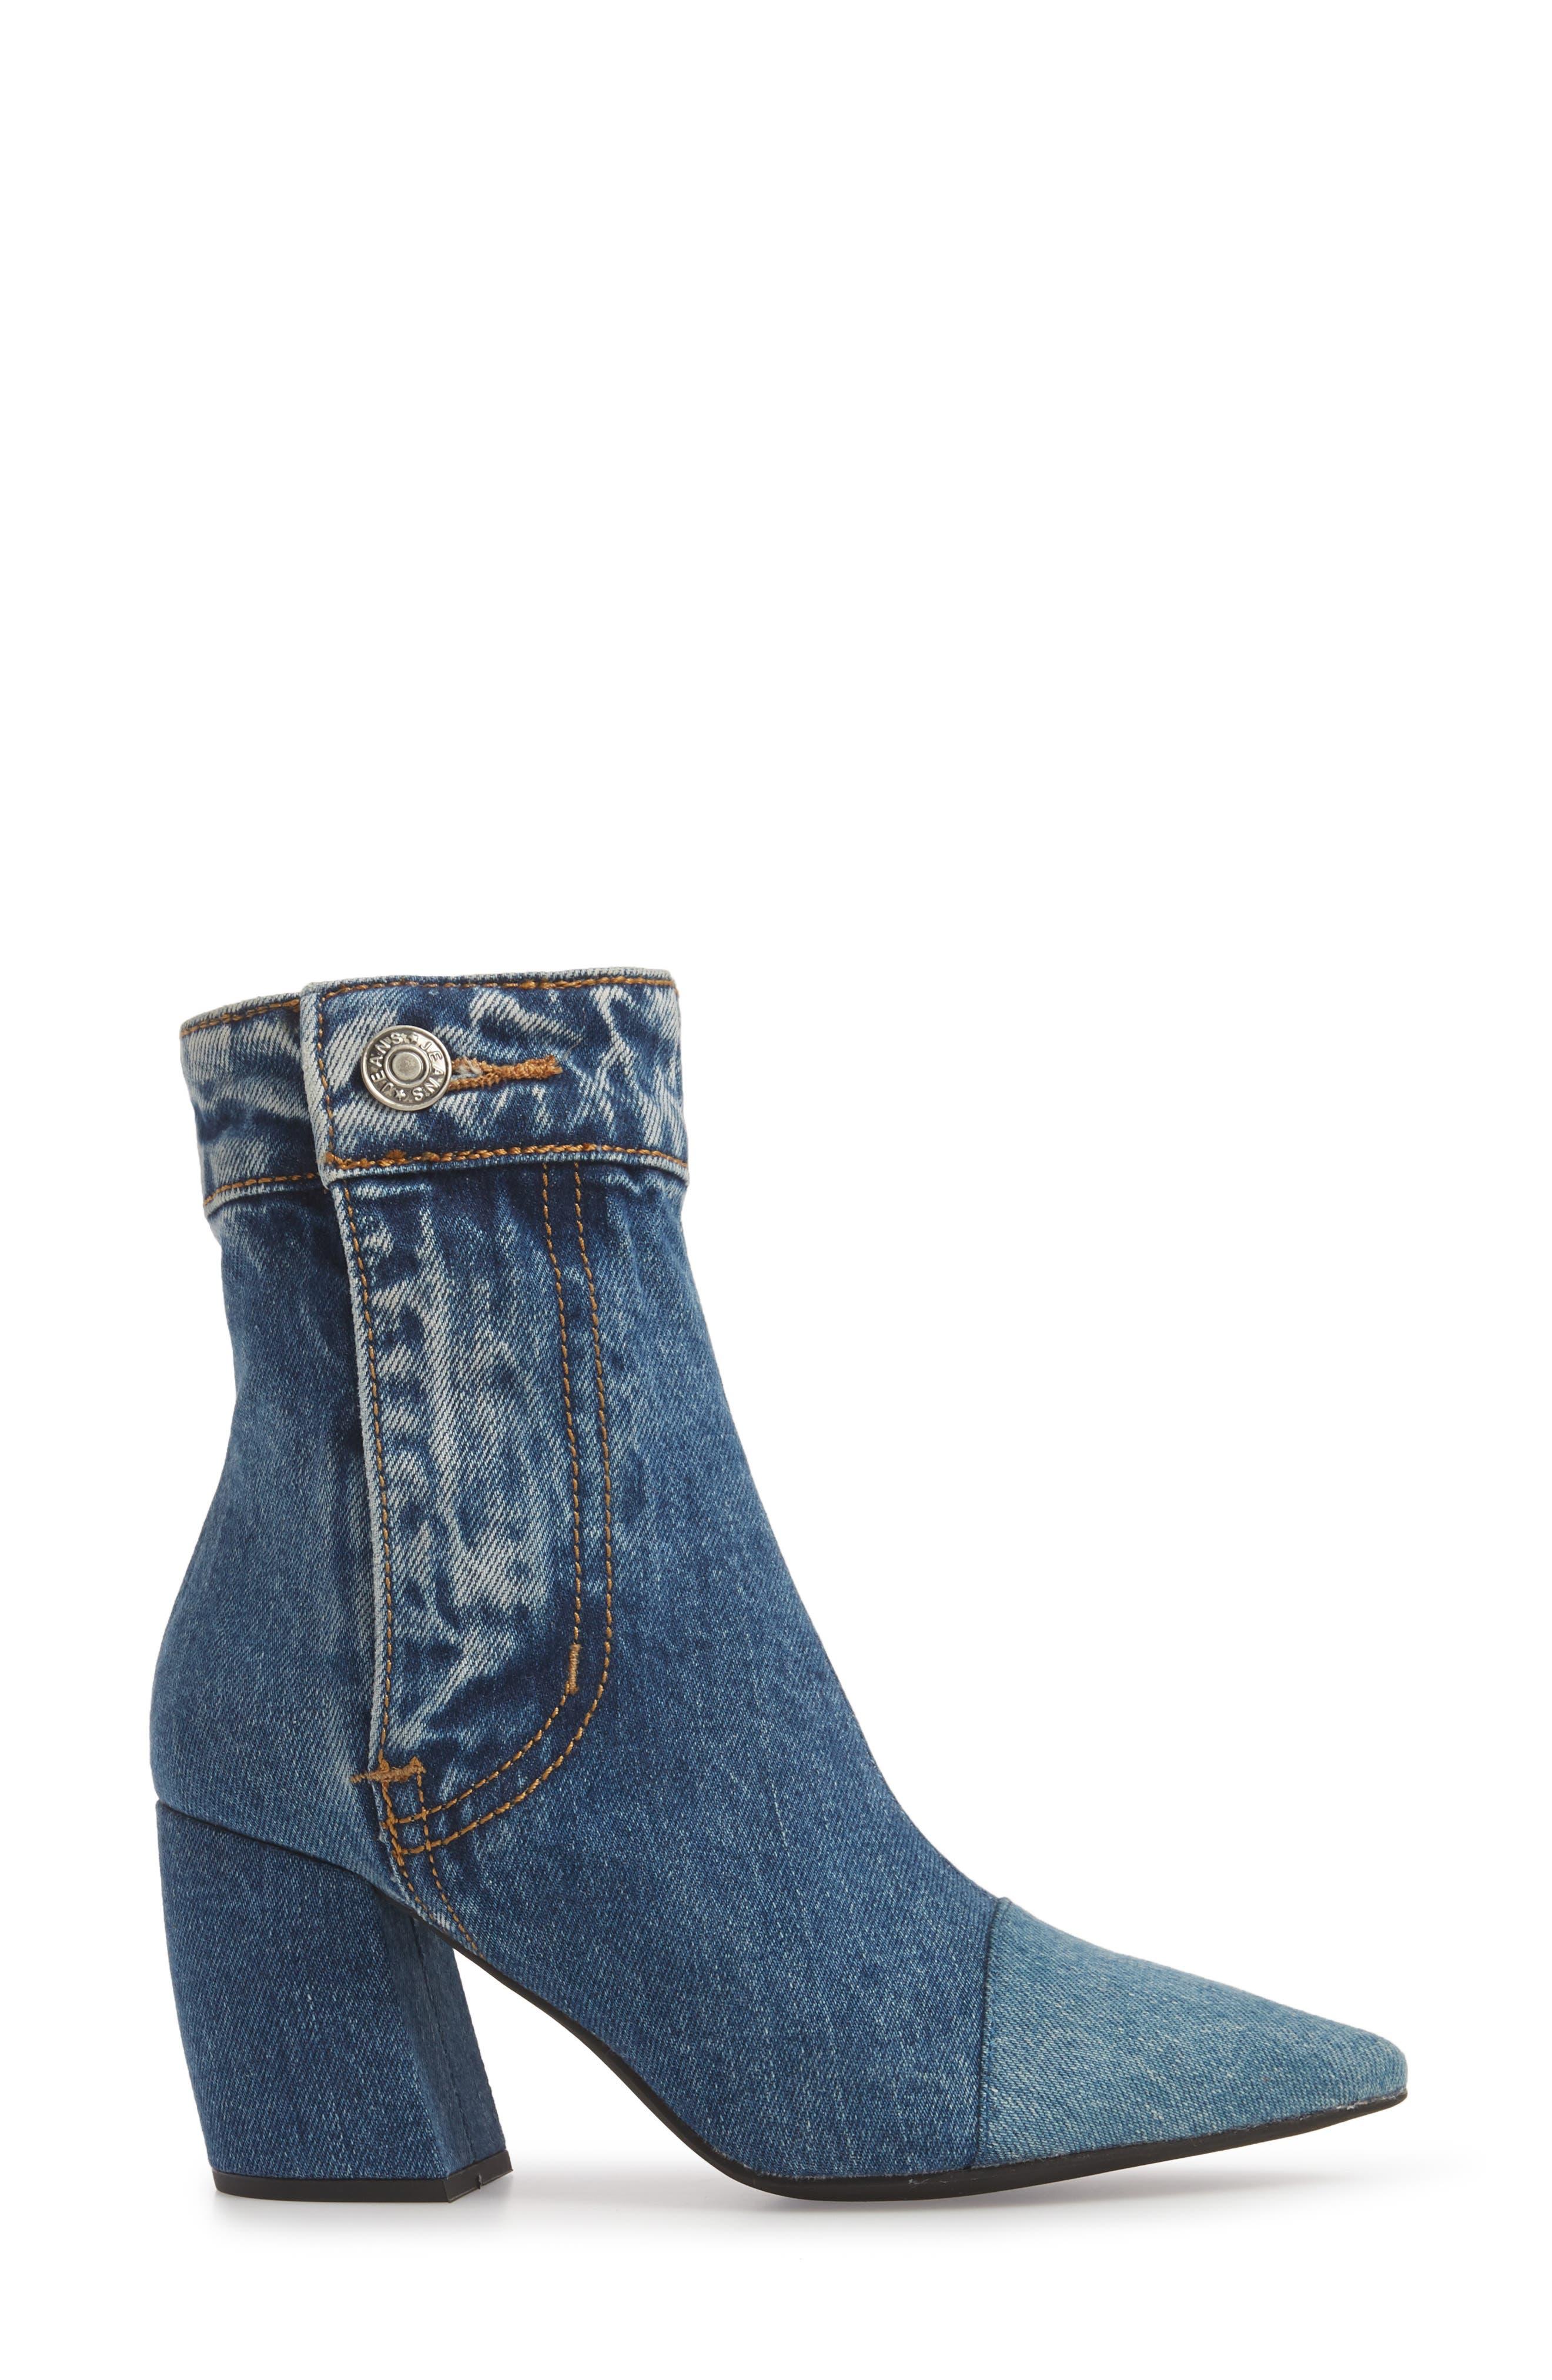 JEFFREY CAMPBELL, Finite Block Heel Bootie, Alternate thumbnail 3, color, BLUE DENIM